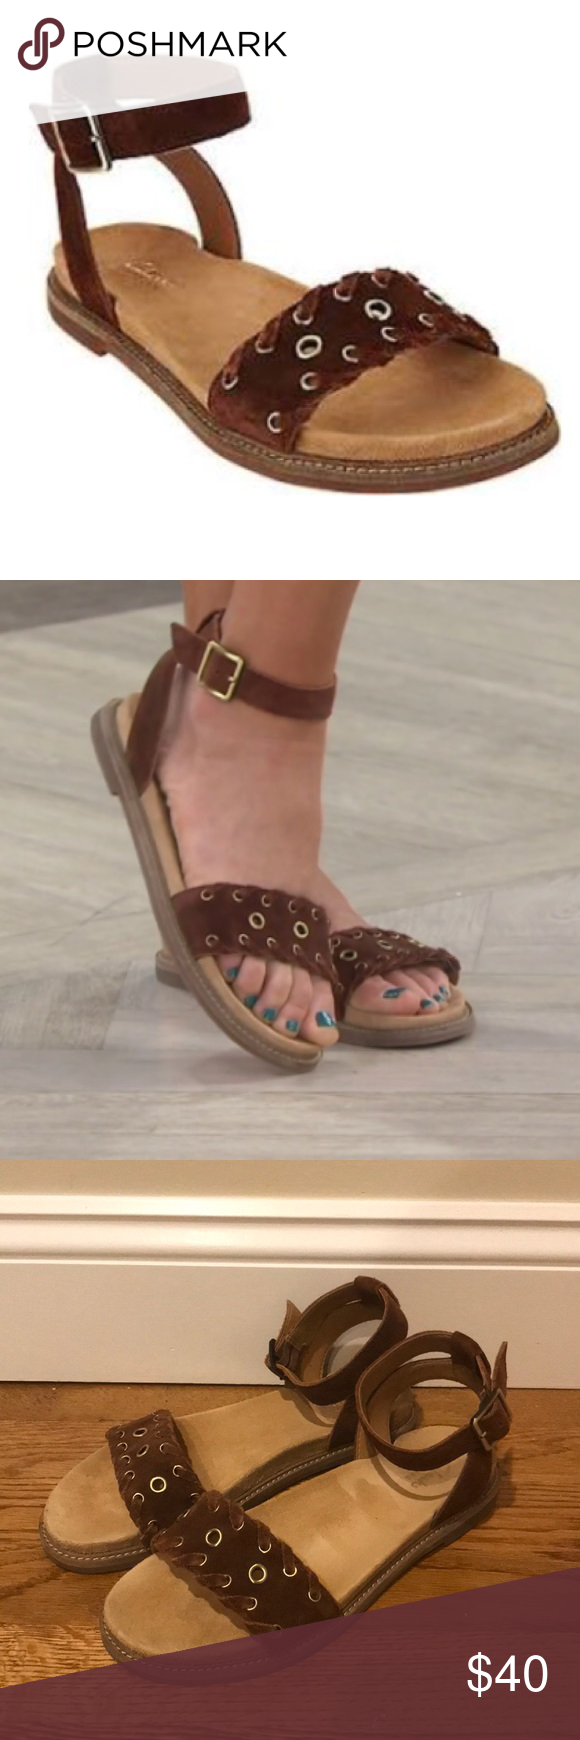 d2d2f161f11 Clarks Corsio Amelia Ankle Strap Suede Sandals 8 Clarks Corsio Amelia  Sandals! These suede sandals